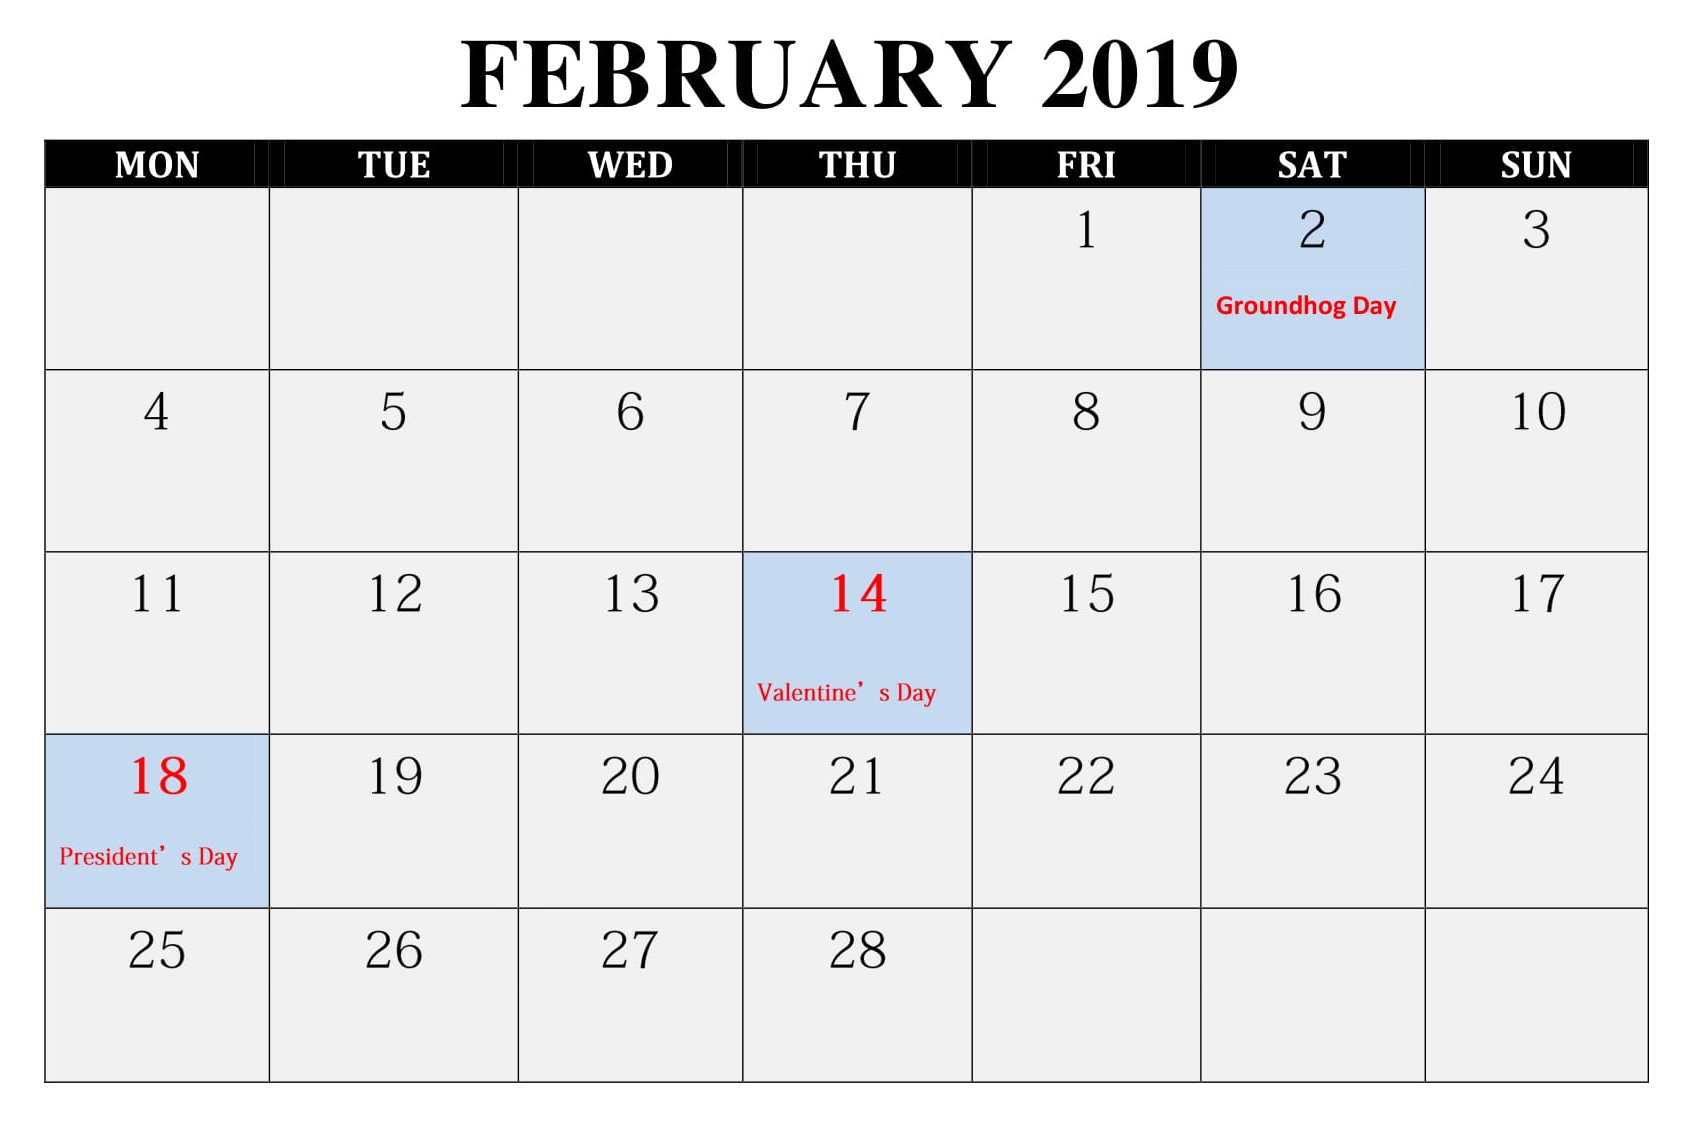 February 2019 Editable Calendar Printable With notes